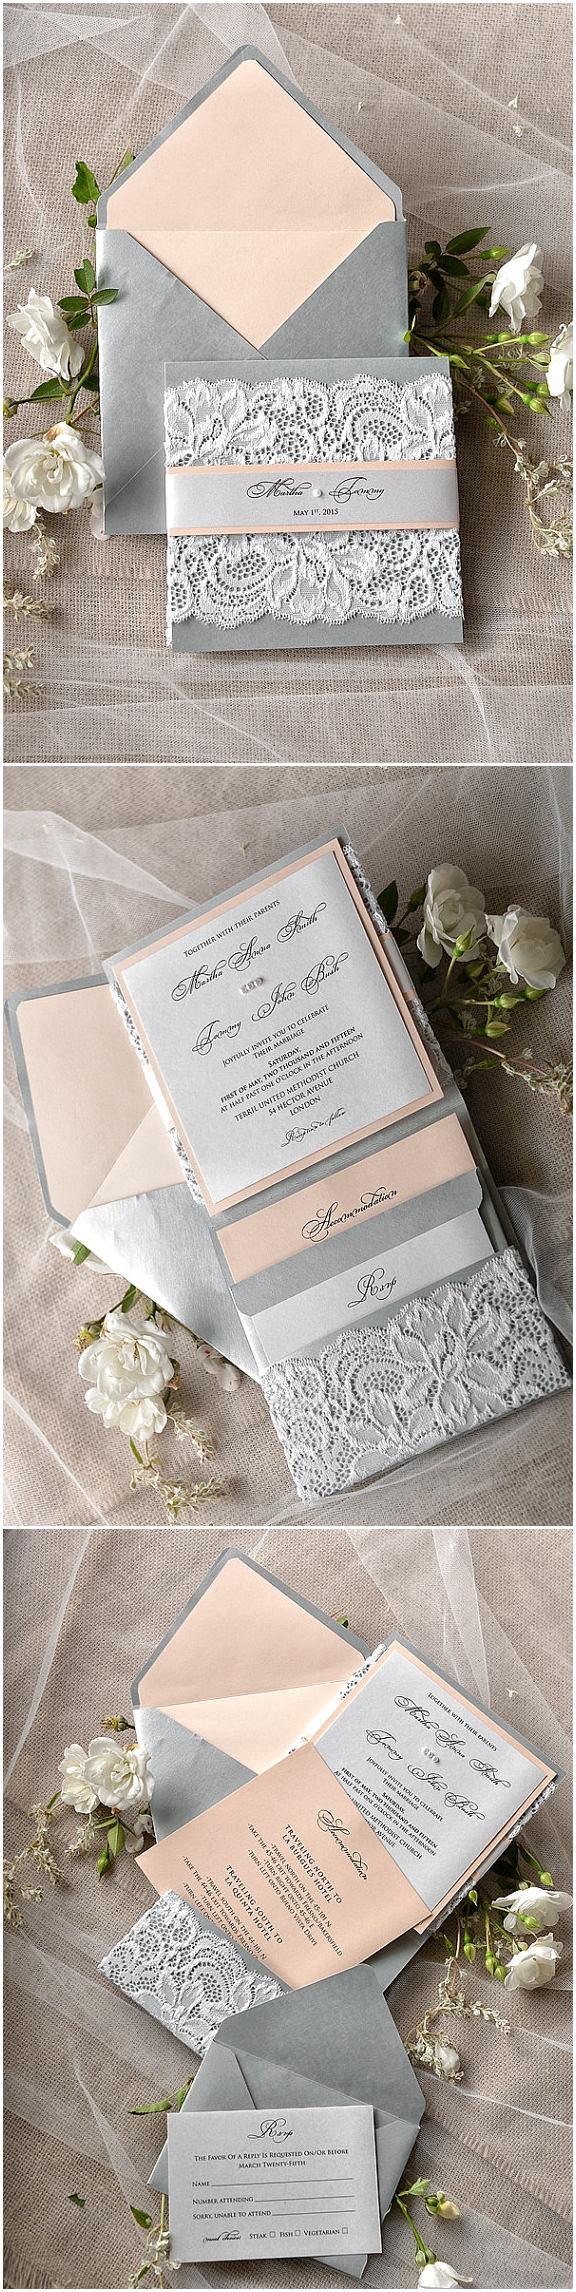 Rustic Vintage Wedding Invitations Top 10 Rustic Wedding Invitations To Wow Your Guests